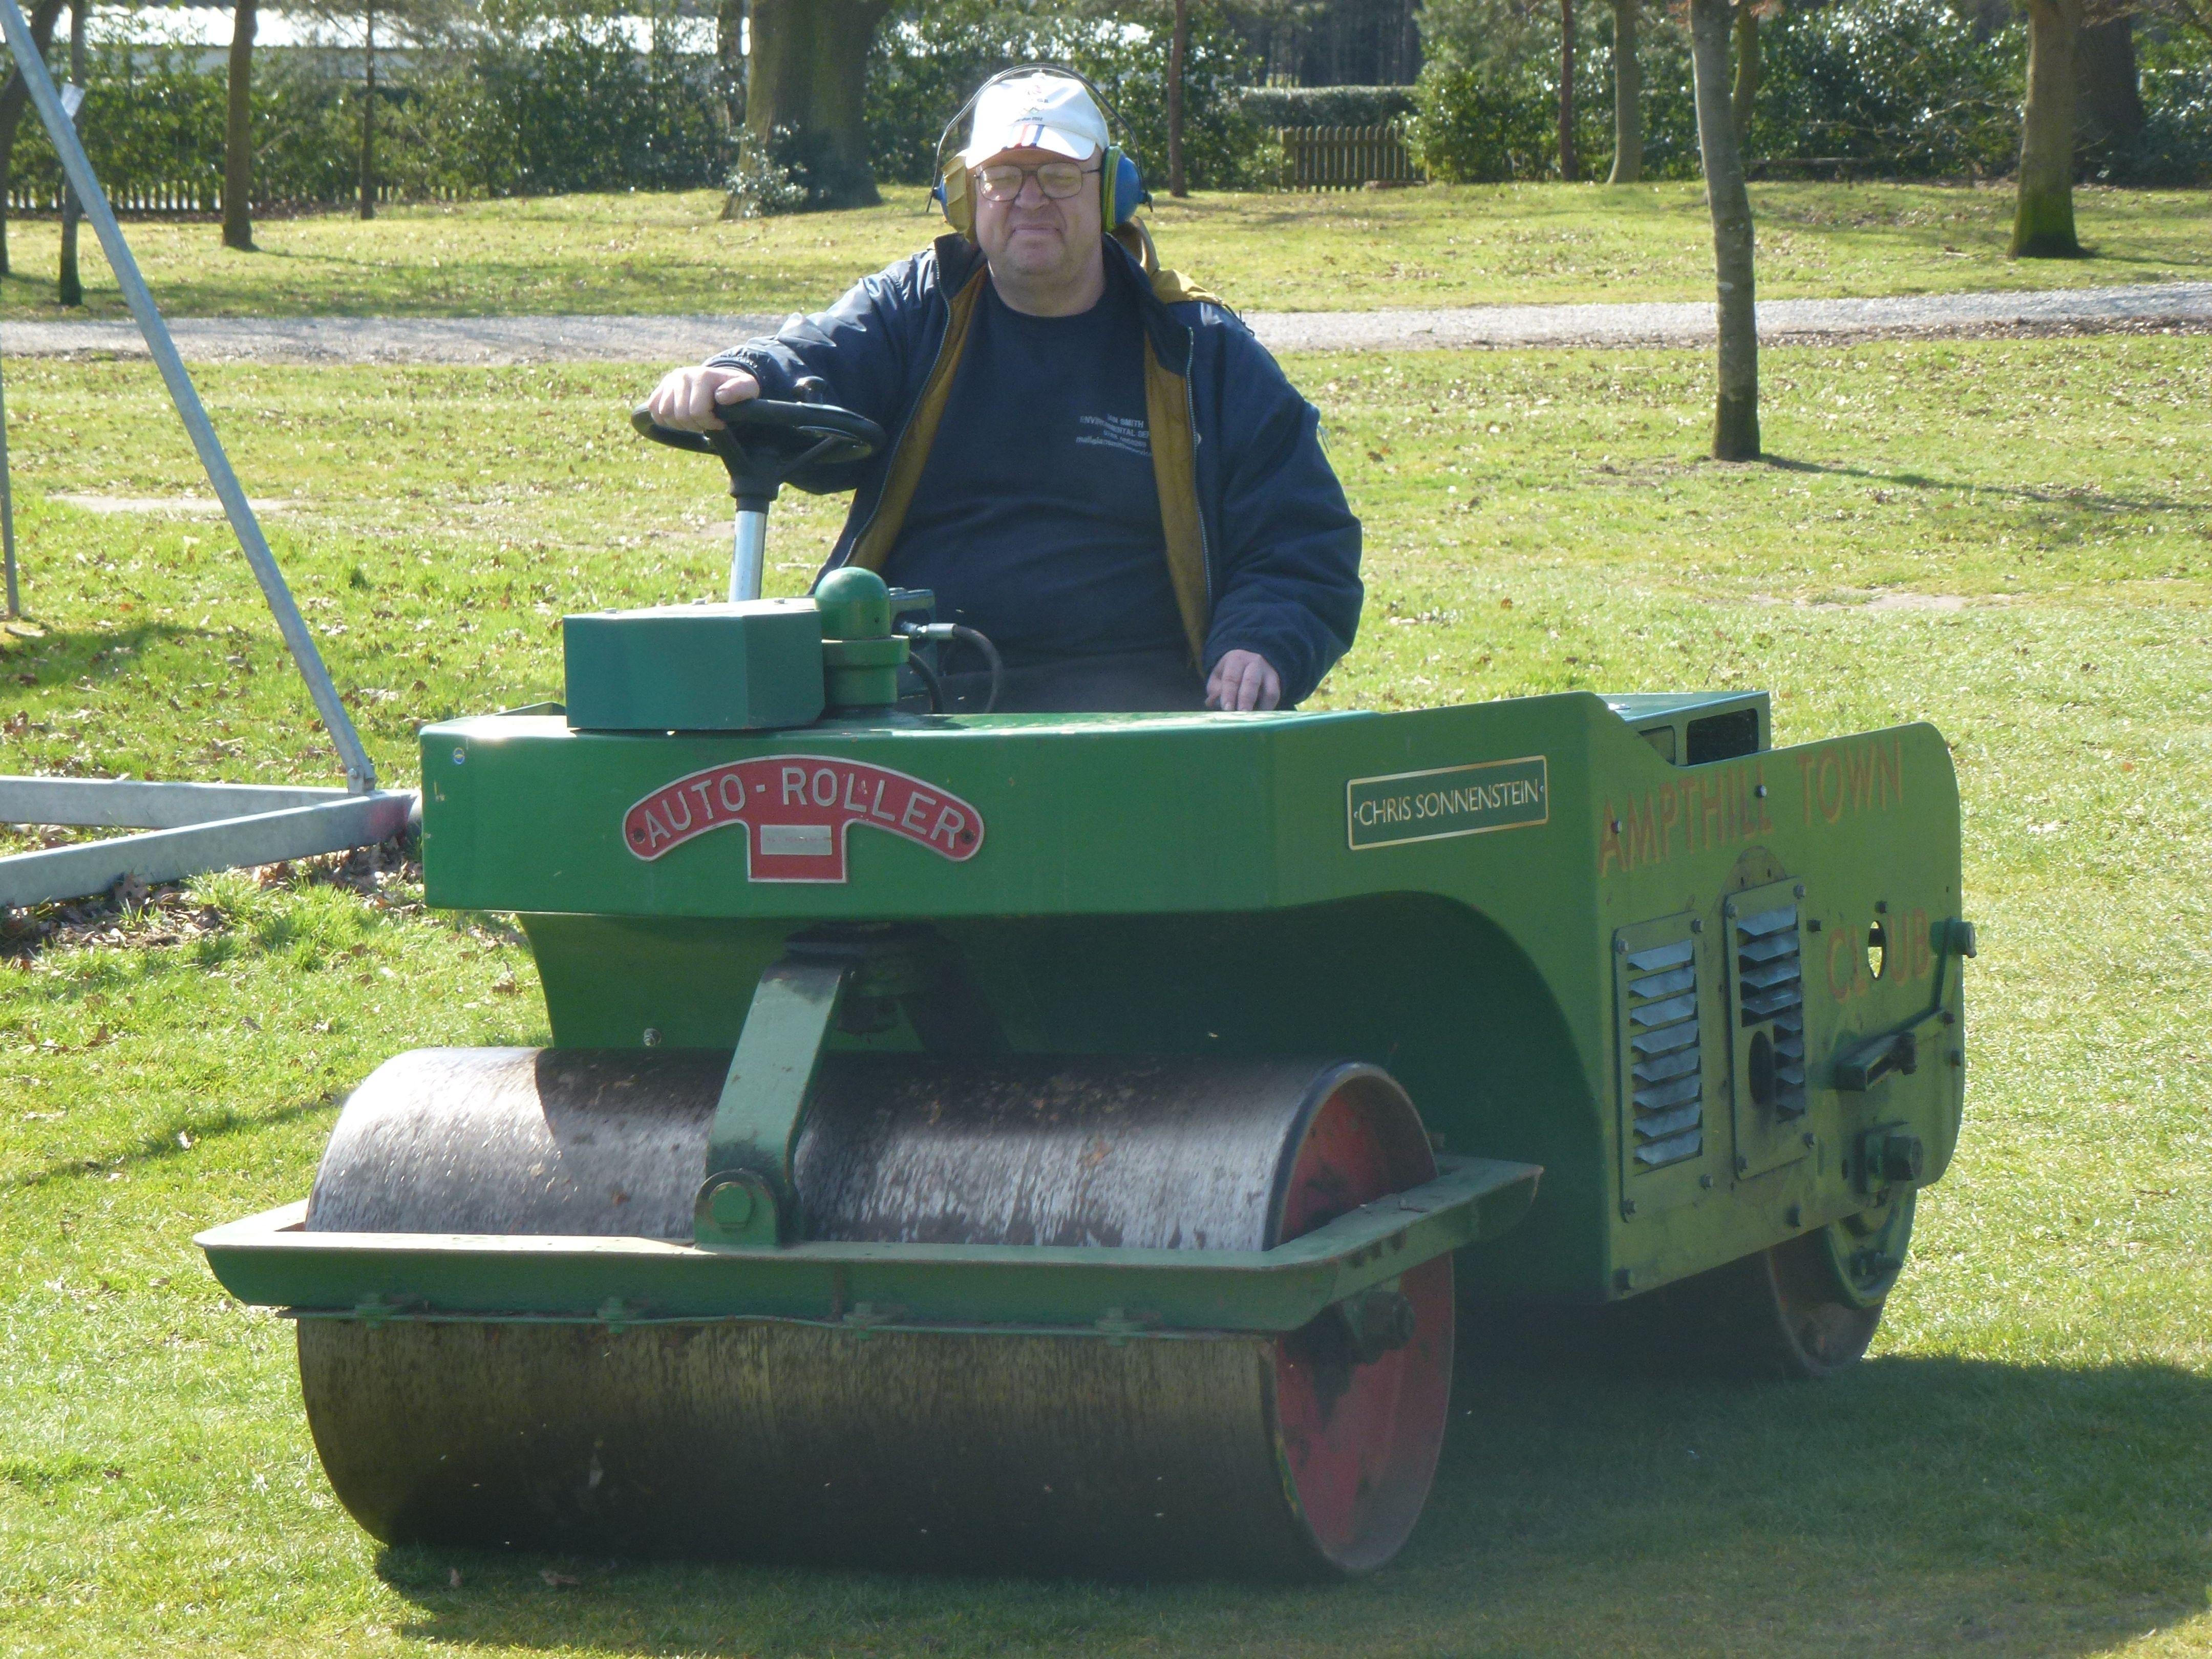 Pin By Ampthill Info On Ampthill Cricket Club Wheelbarrow Outdoor Decor Garden Tools